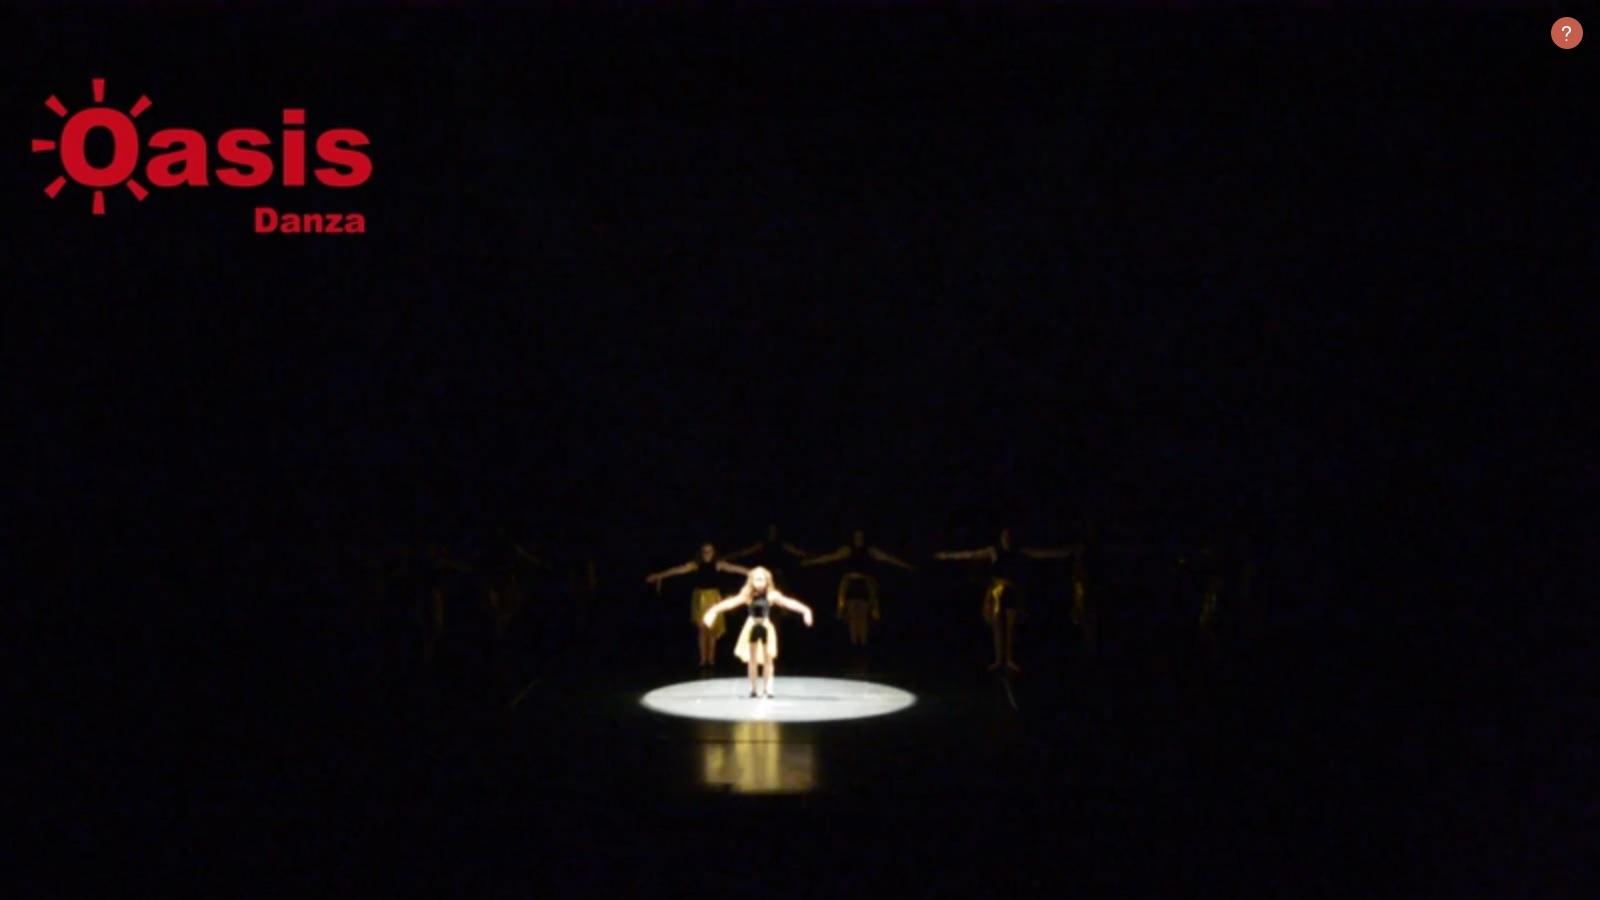 portada del video danza moderna mayores